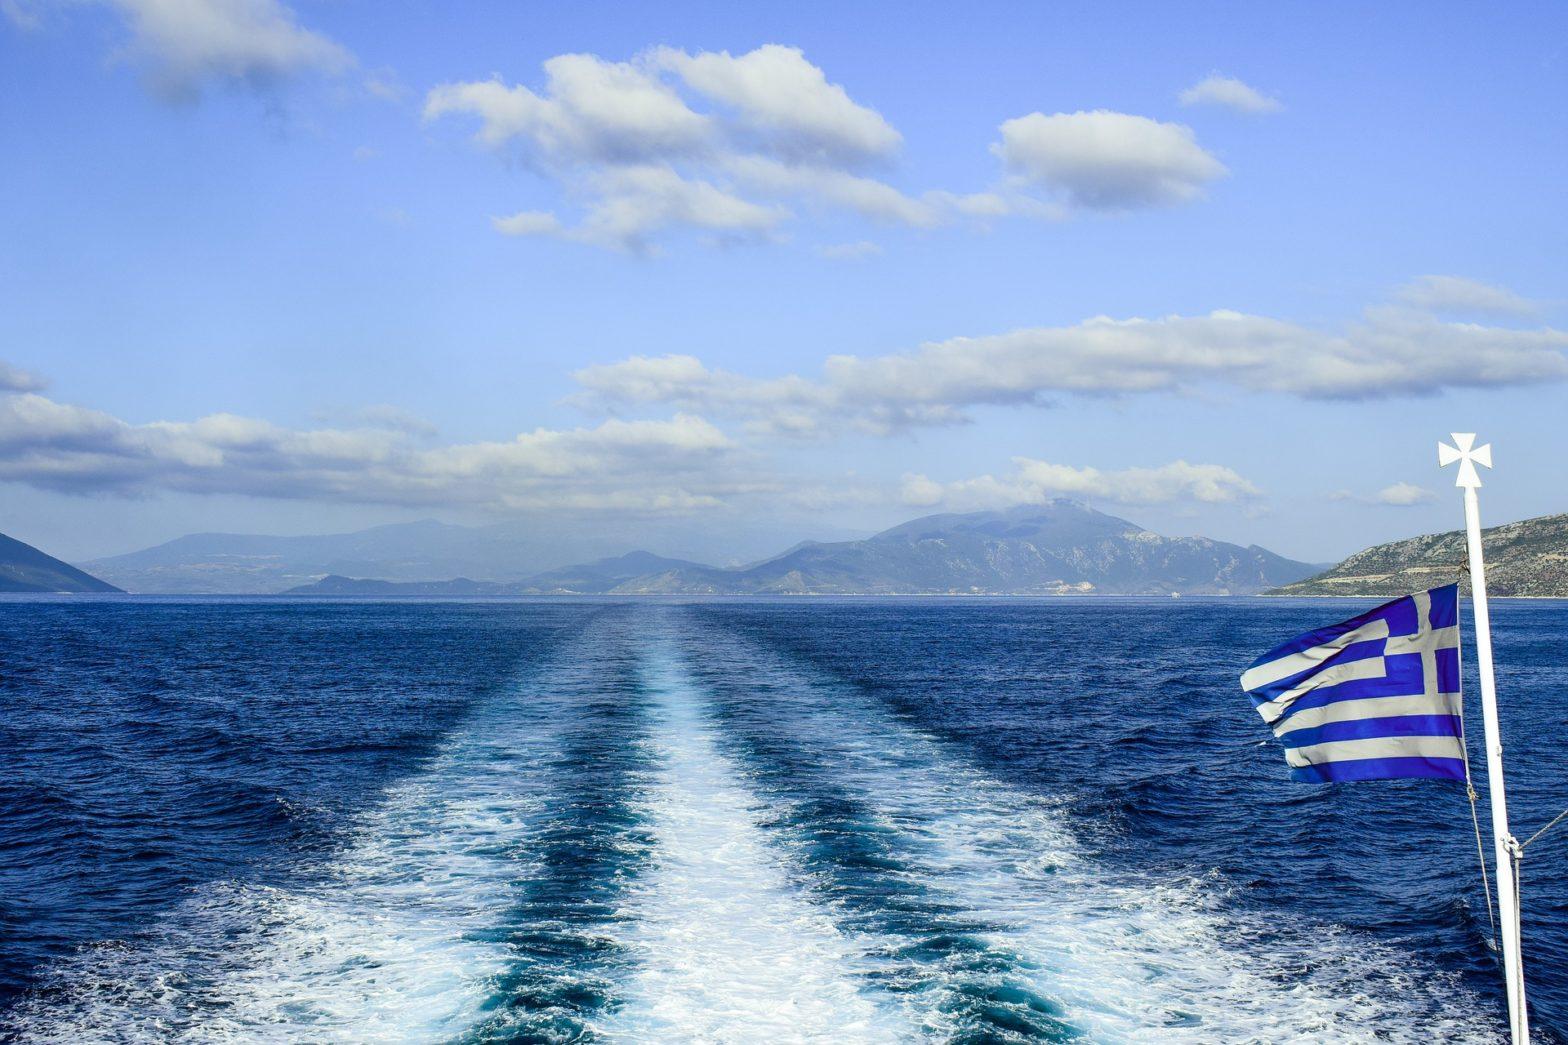 Greek flag on back of ferry